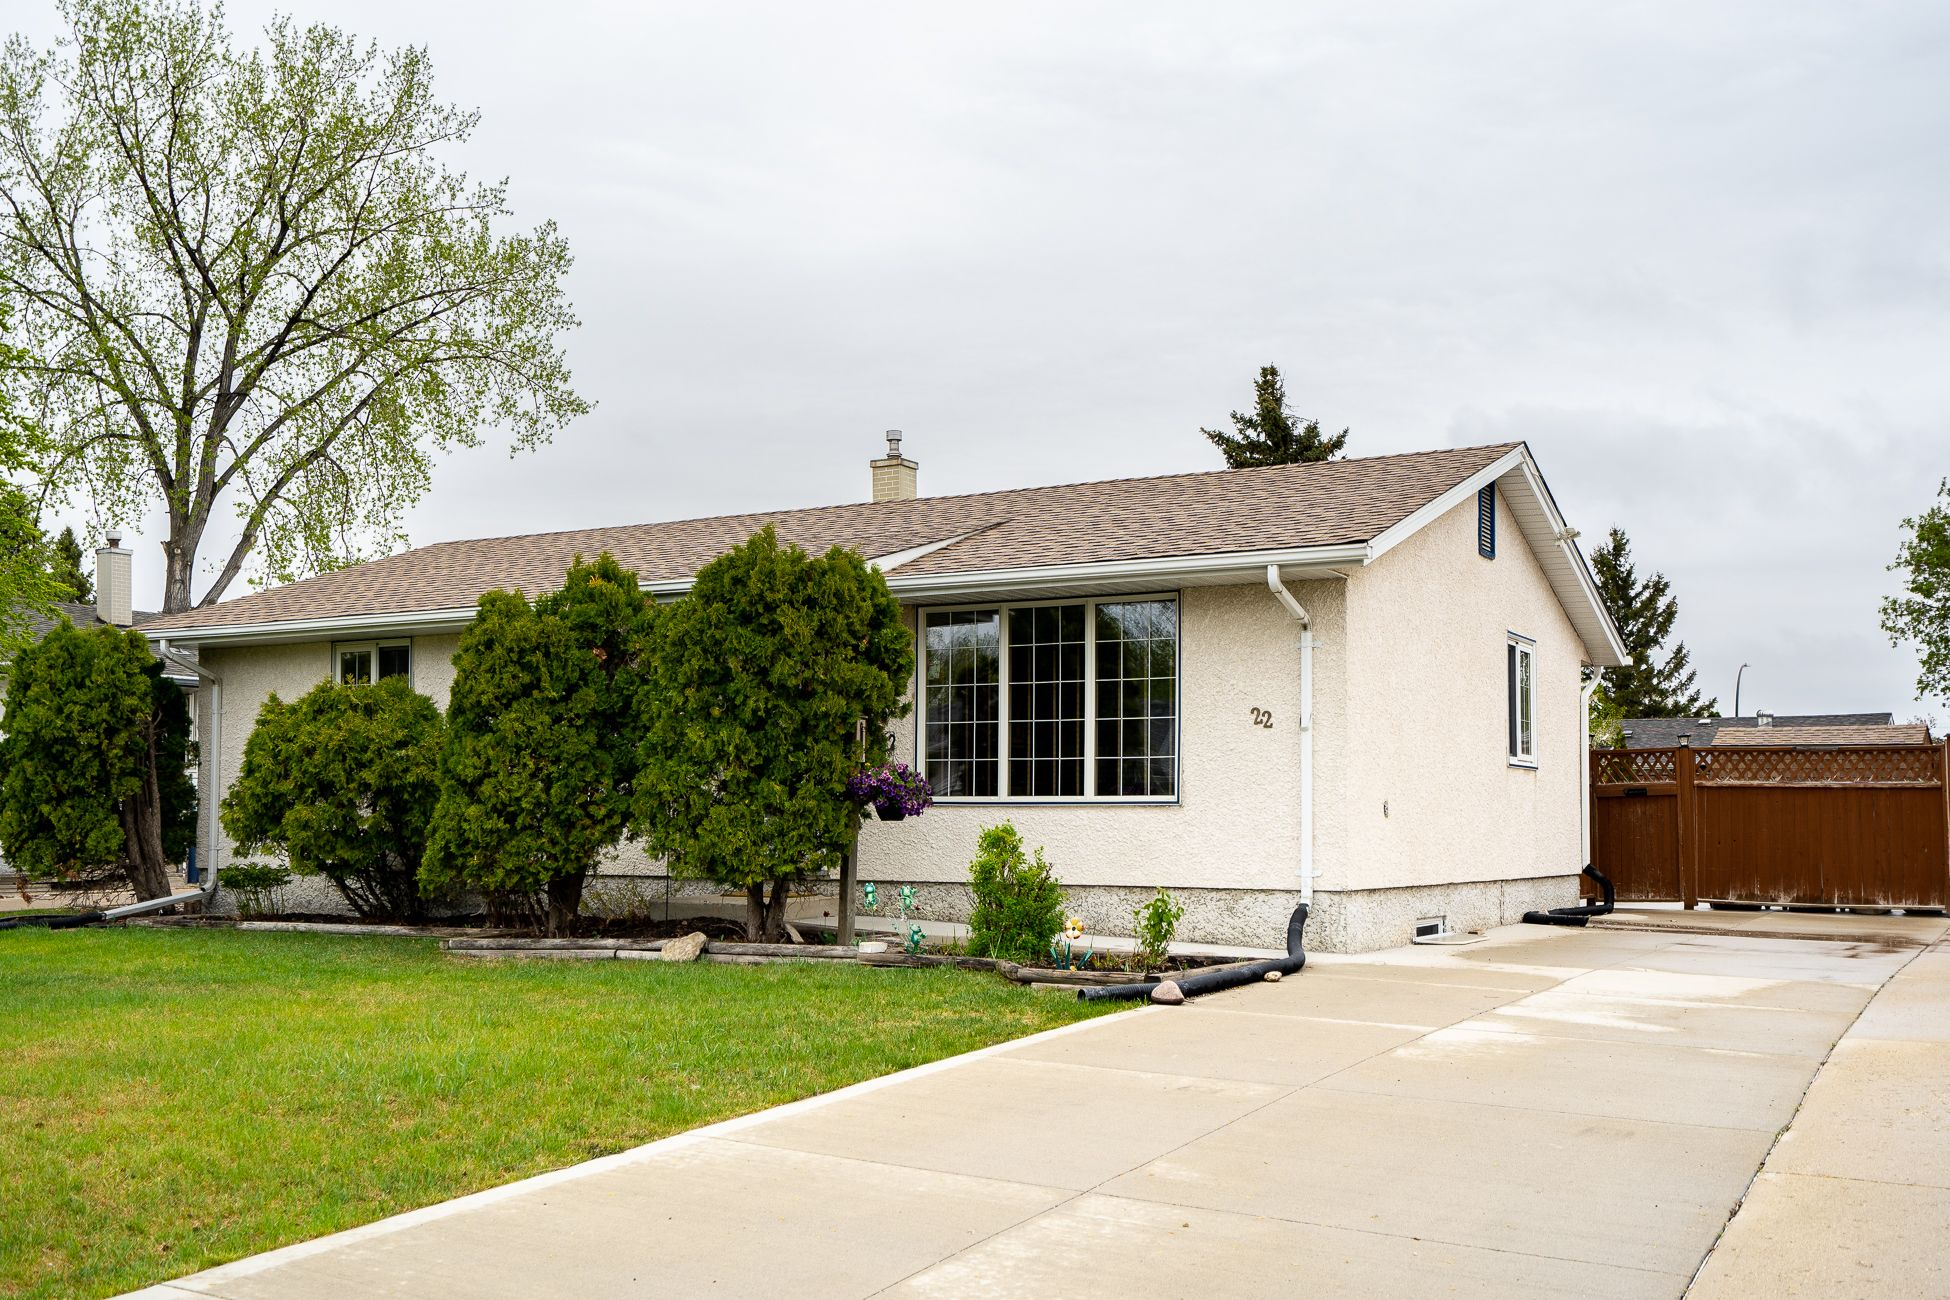 Main Photo: 22 Farnham Road in Winnipeg: Southdale House for sale (2H)  : MLS®# 202112010